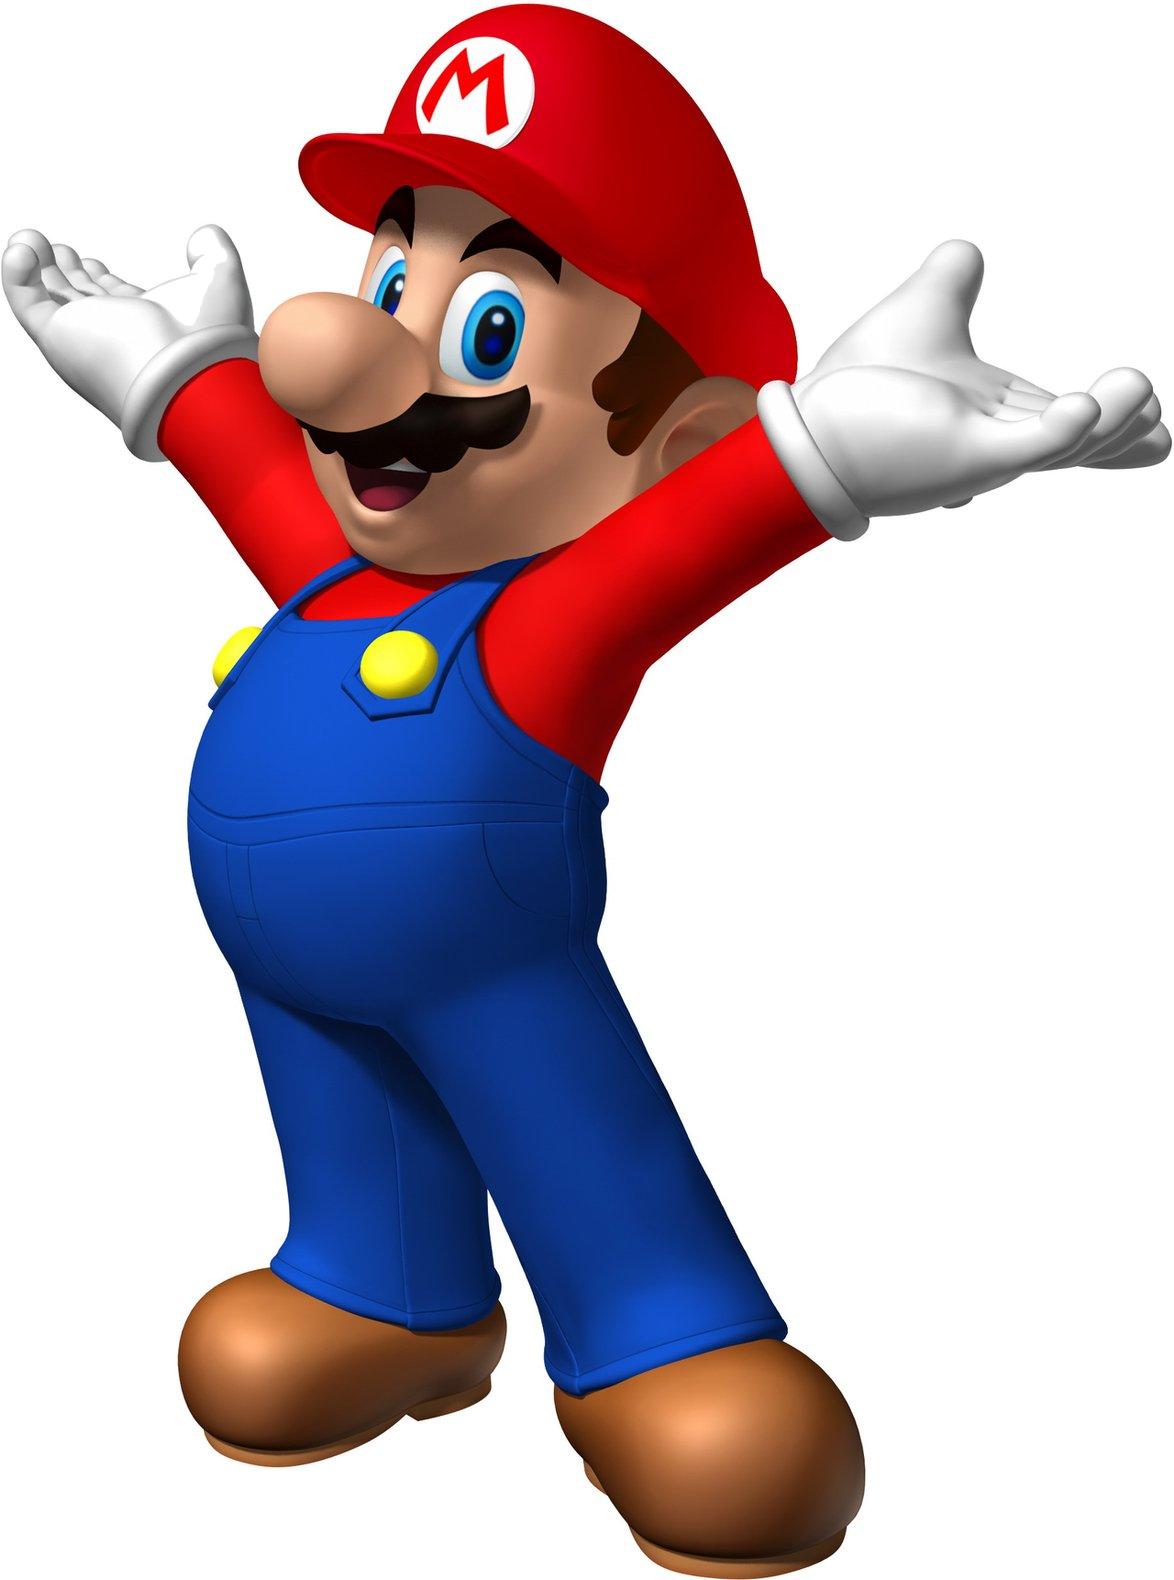 Super Mario Evolution - Fantendo, the Nintendo Fanon Wiki - Nintendo